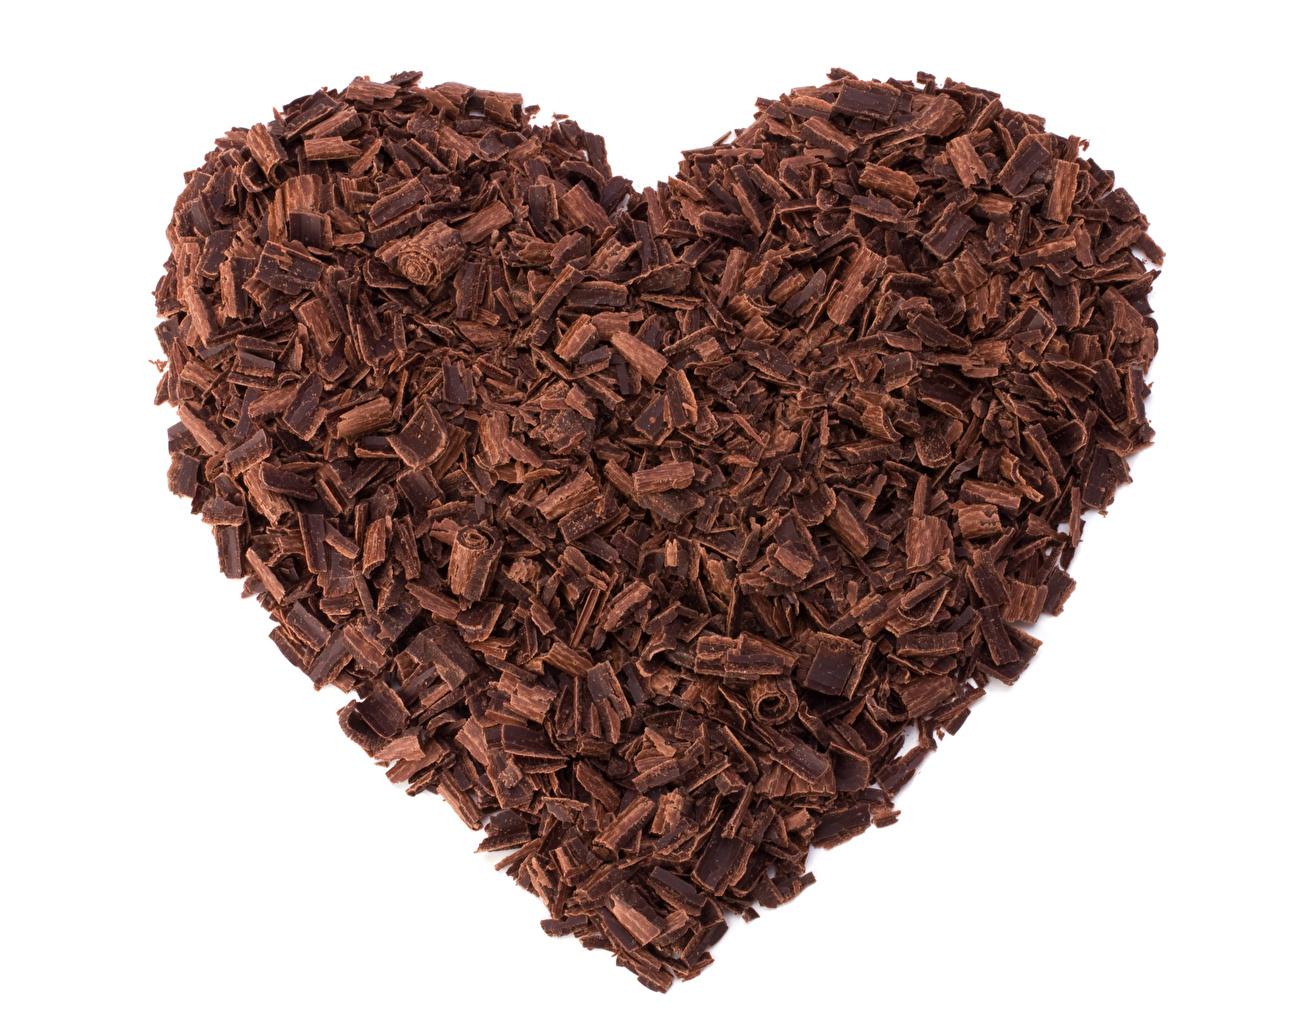 Картинки День святого Валентина Сердце Шоколад Пища белом фоне